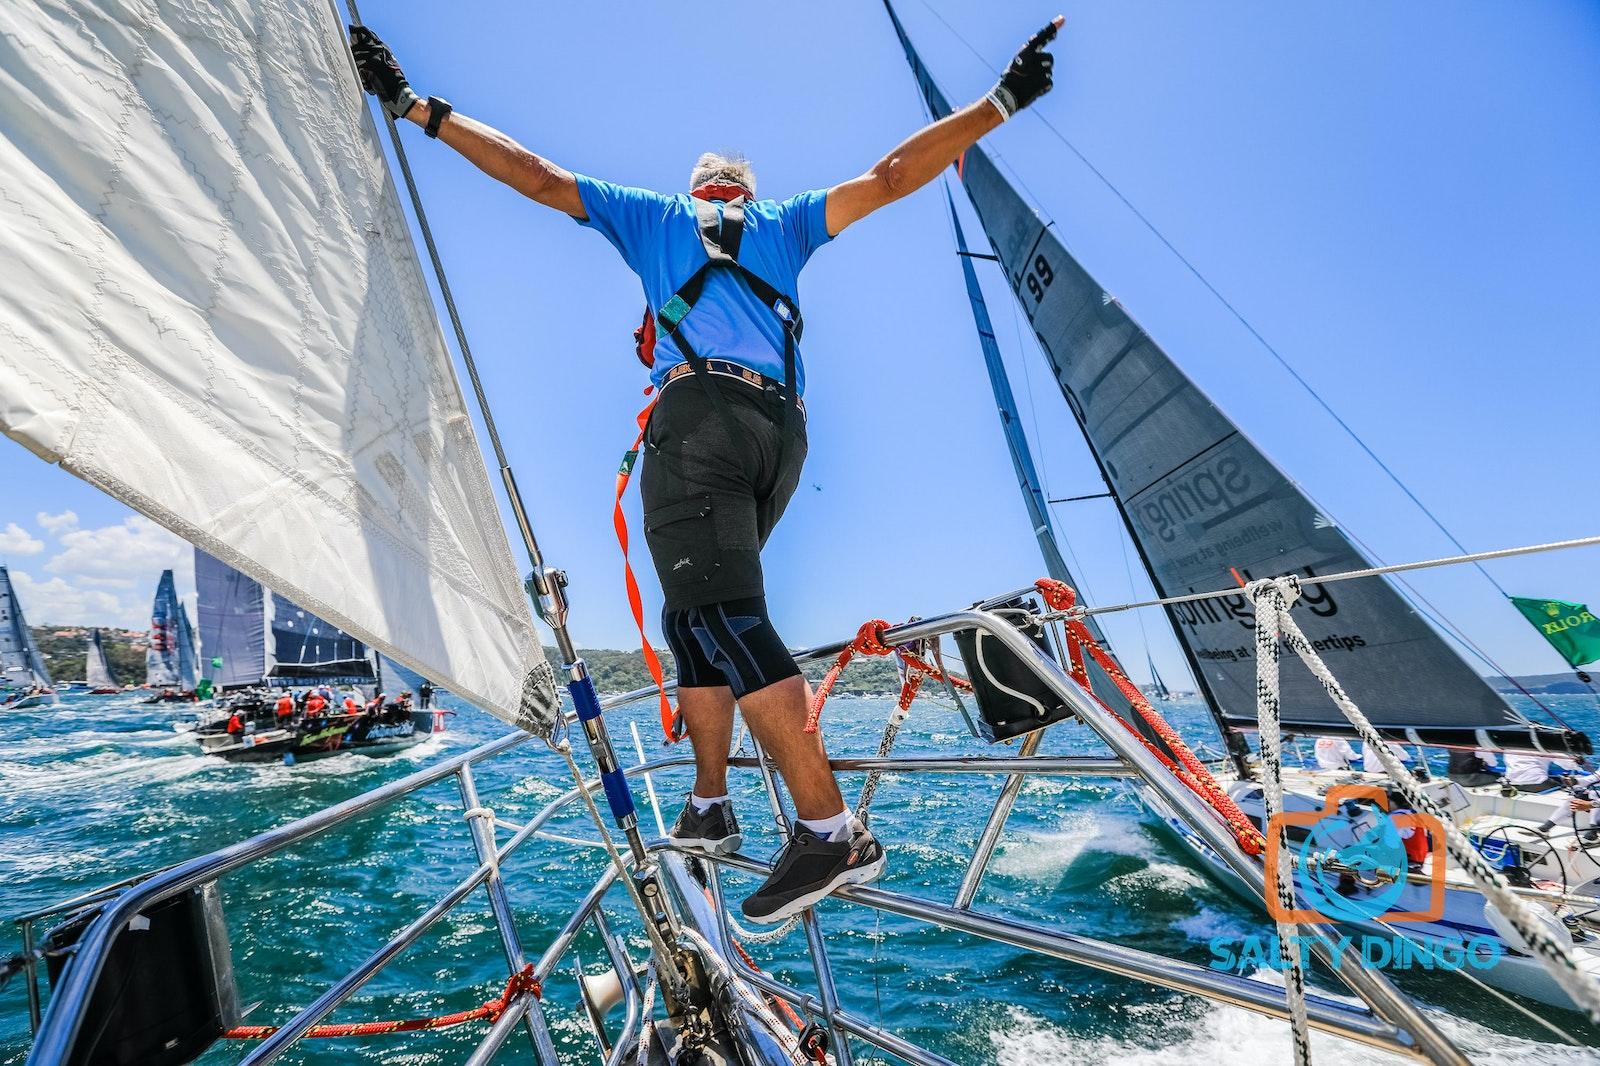 RSHYR Salty Dingo-9323 - Rolex Sydney Hobart Yacht Race 2016 aboard Clipper Ventures 5.  #RSHYR #teamsaltydingo Picture Salty Dingo ALL USE MUST CREDIT...